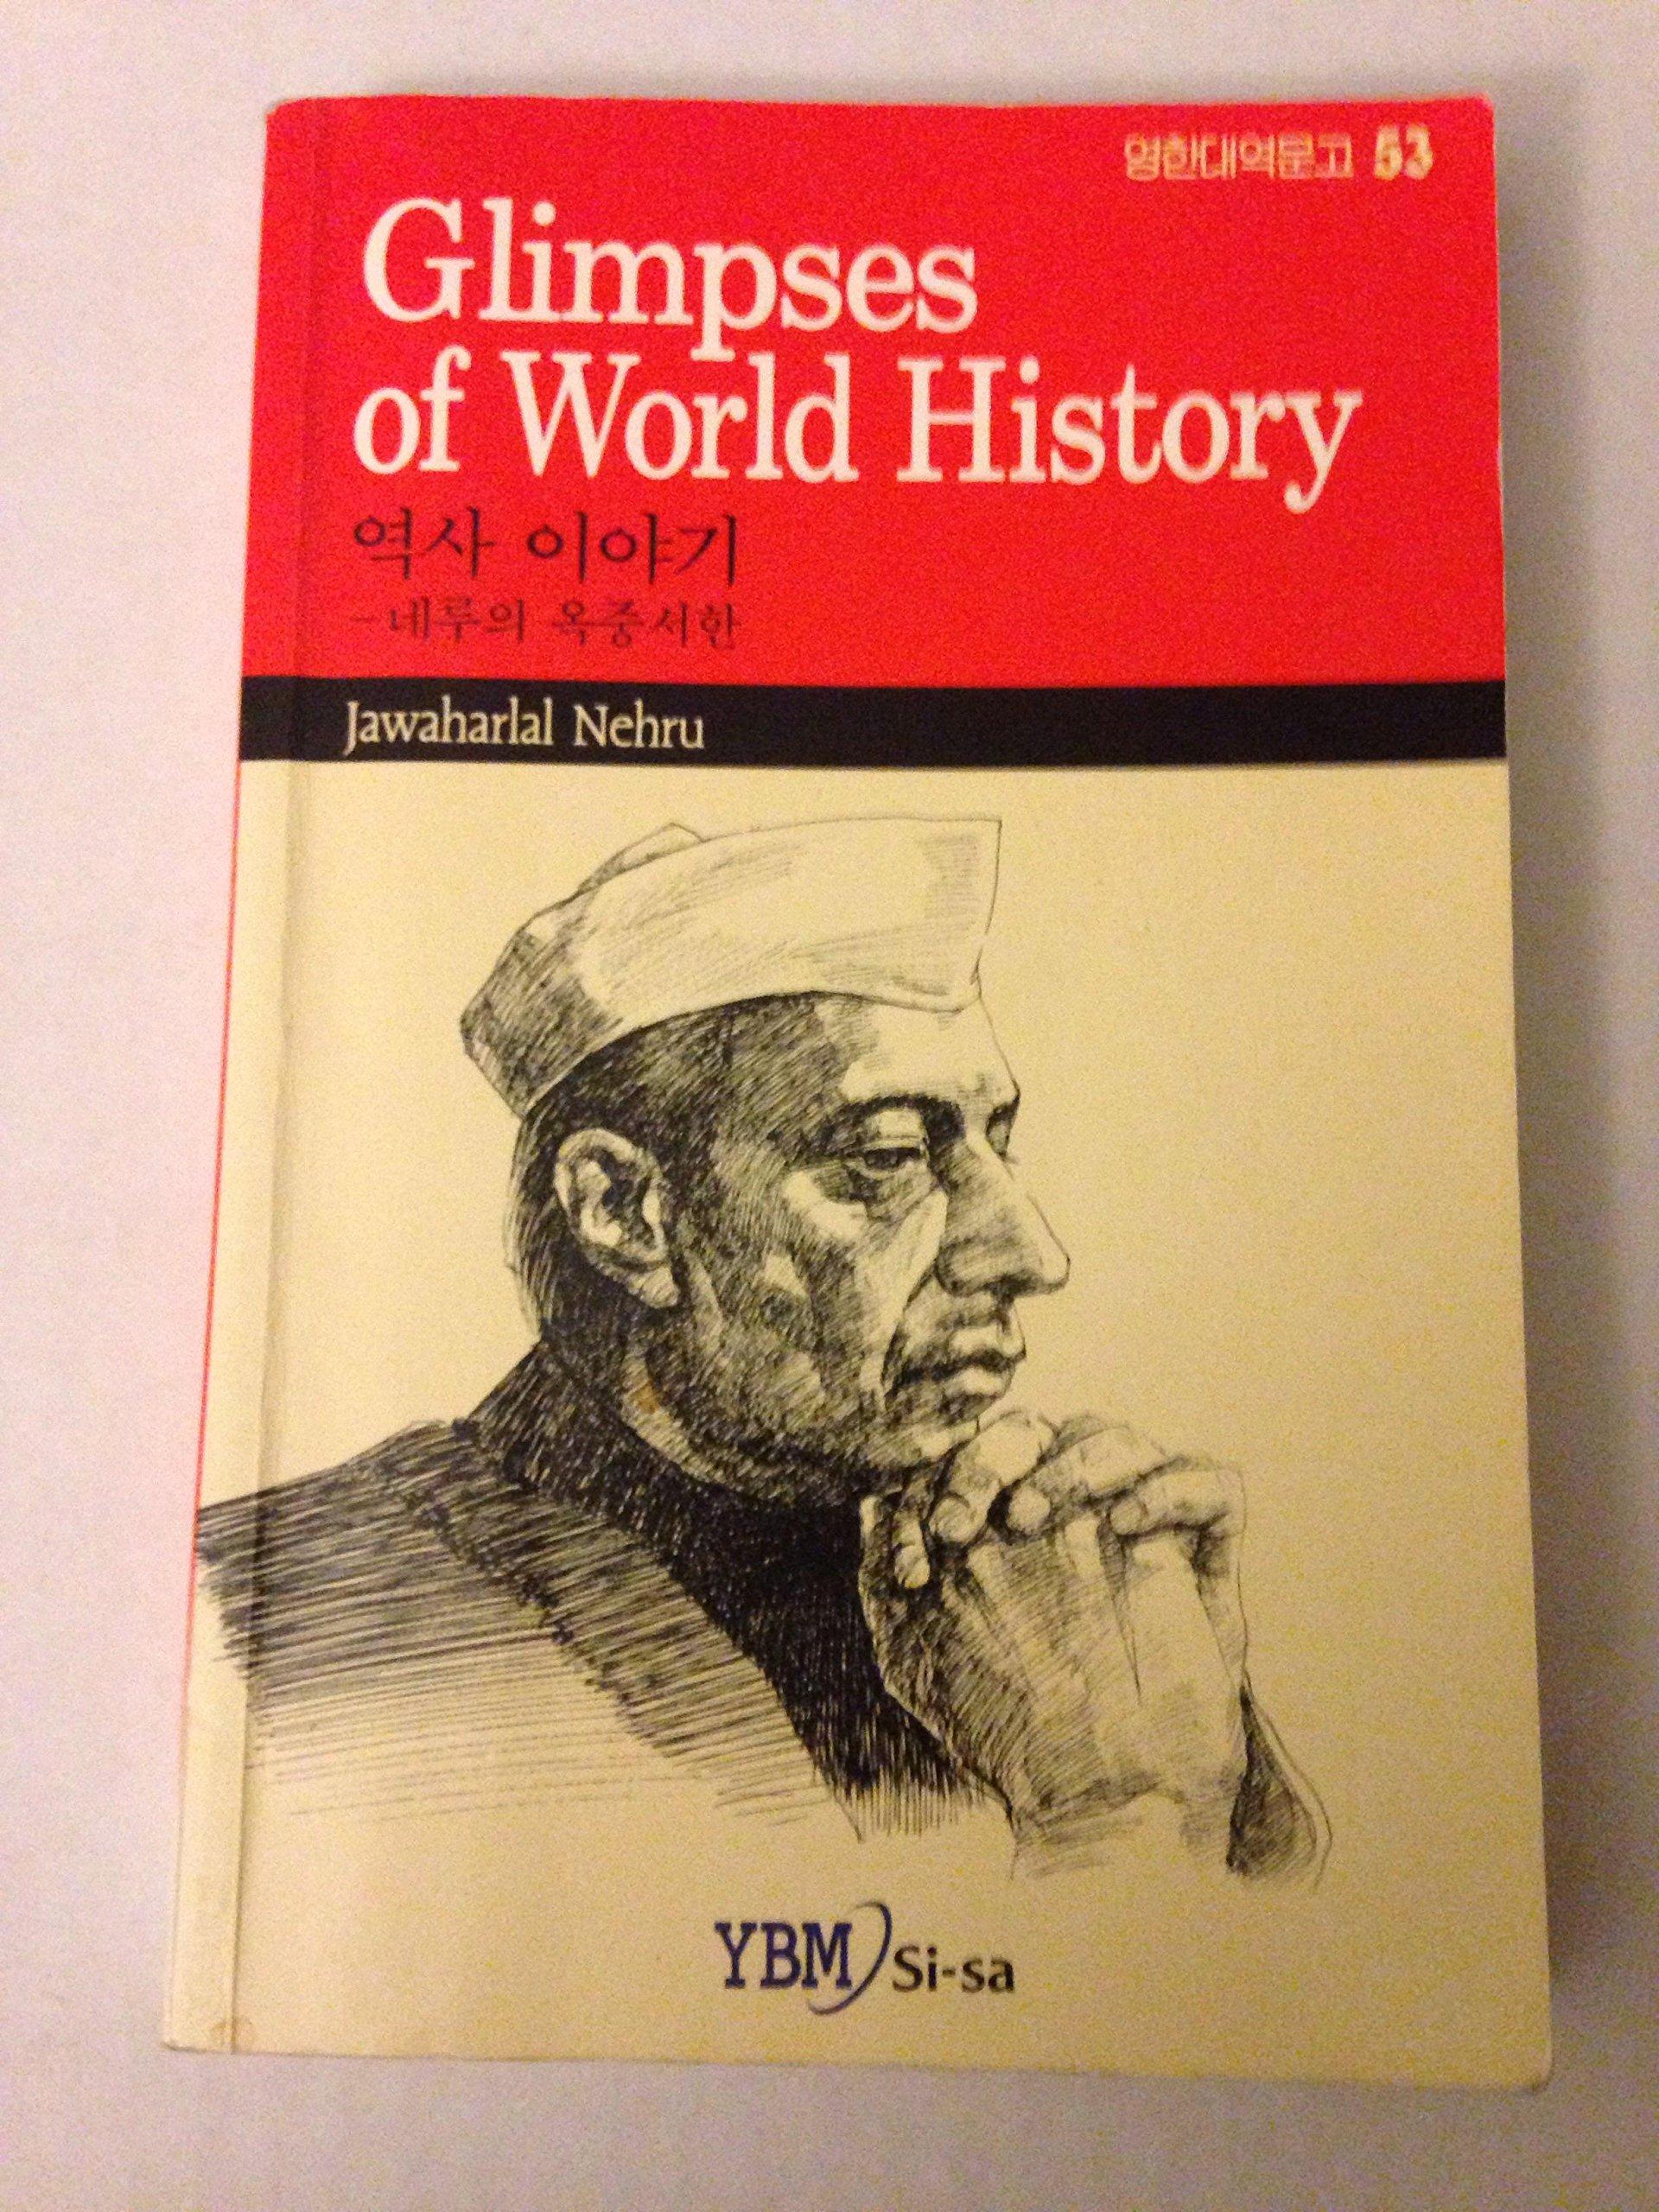 Jawaharlal Nehru Books Pdf